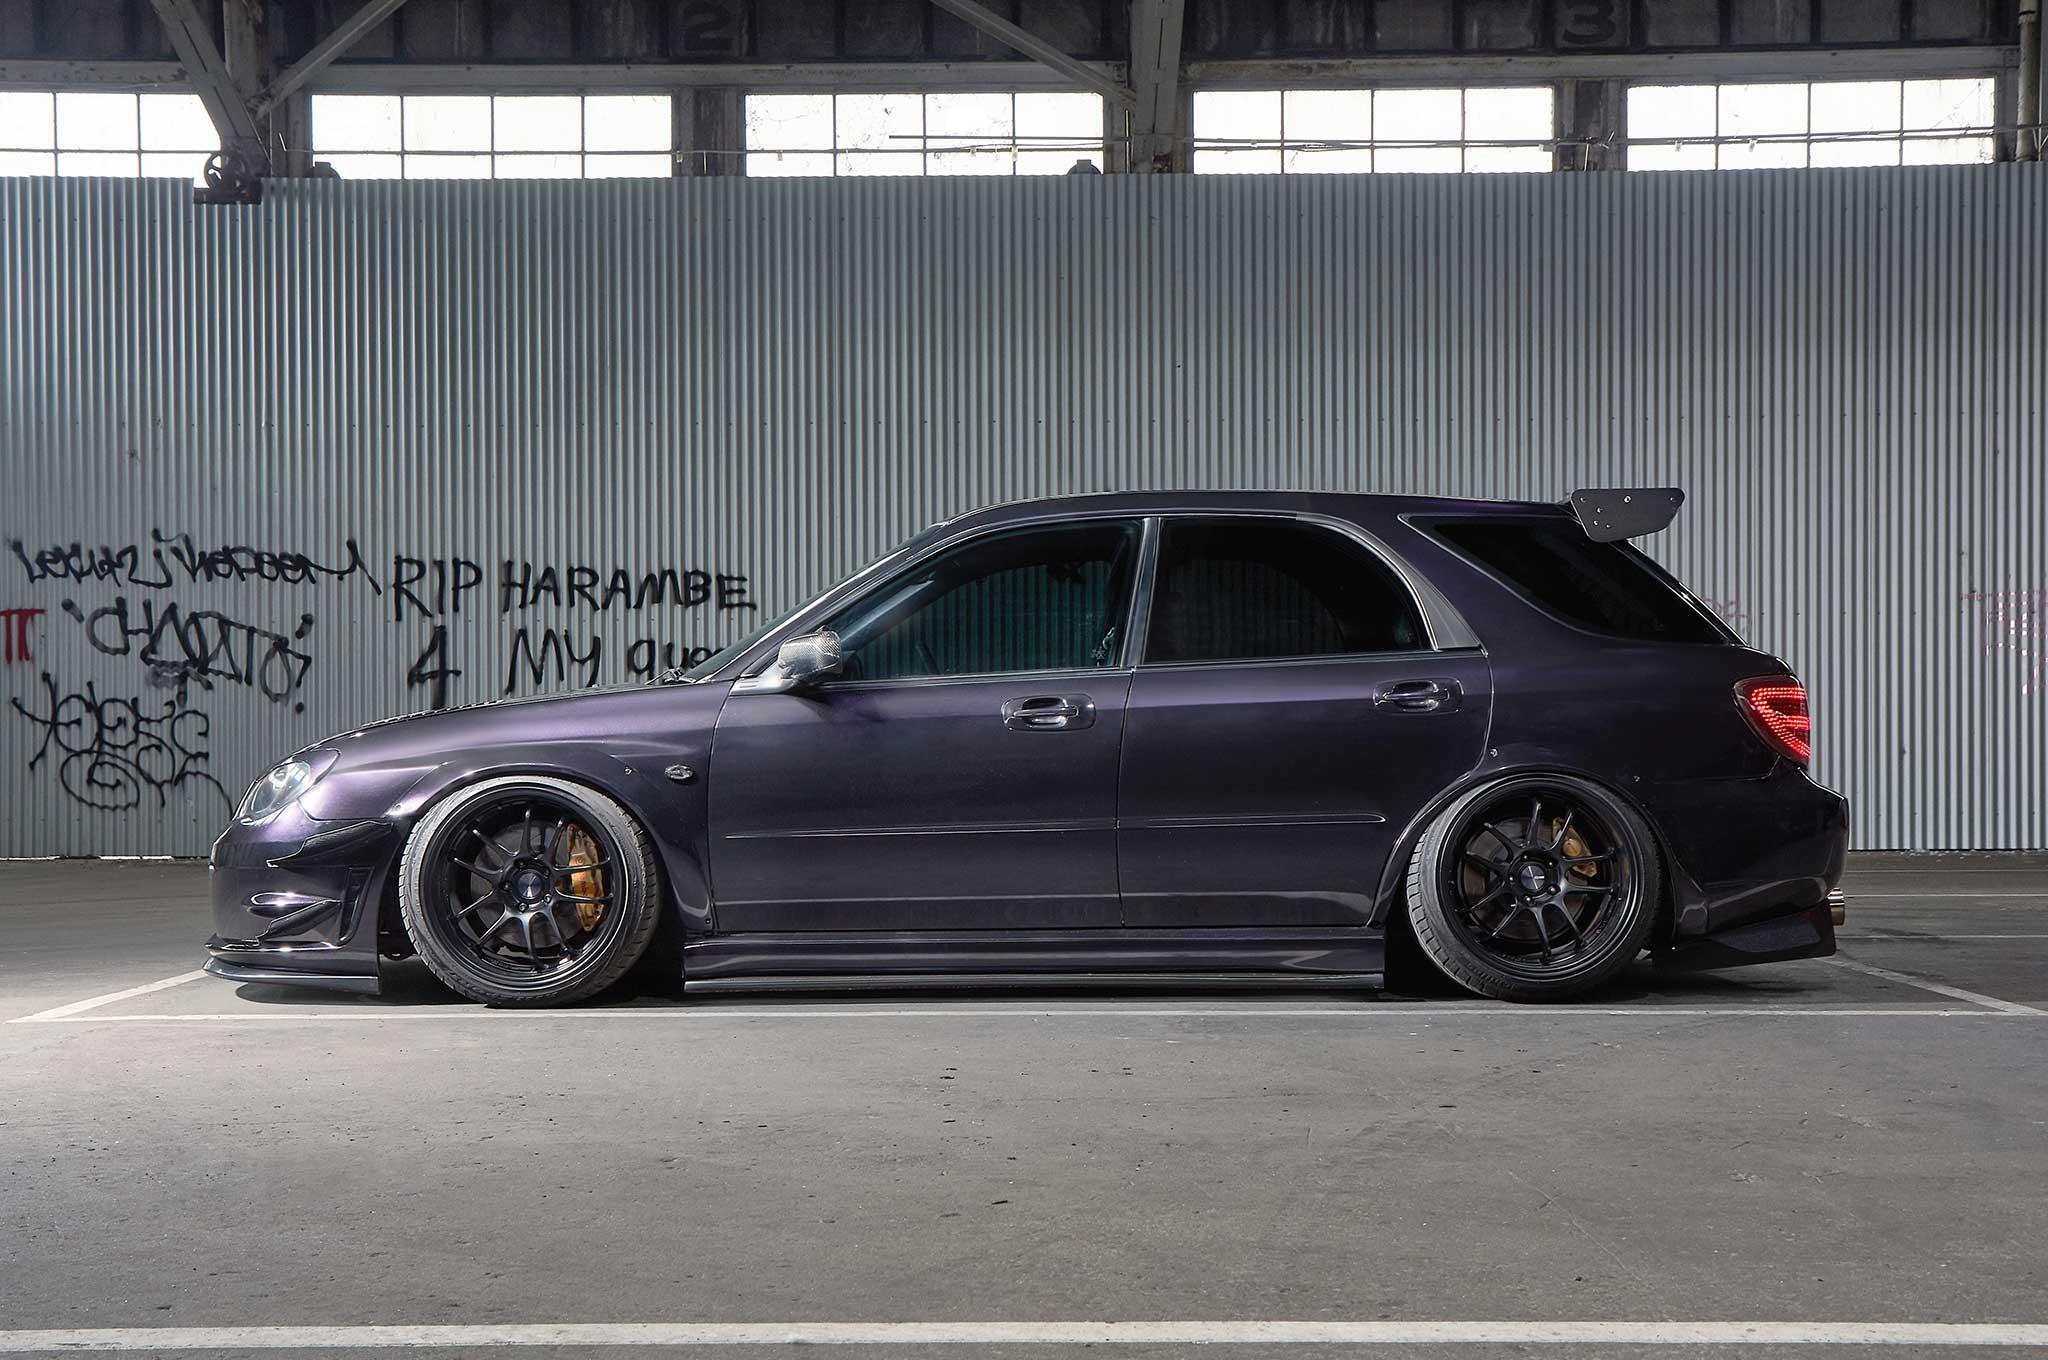 Sti Ed Subaru Impreza Wagon